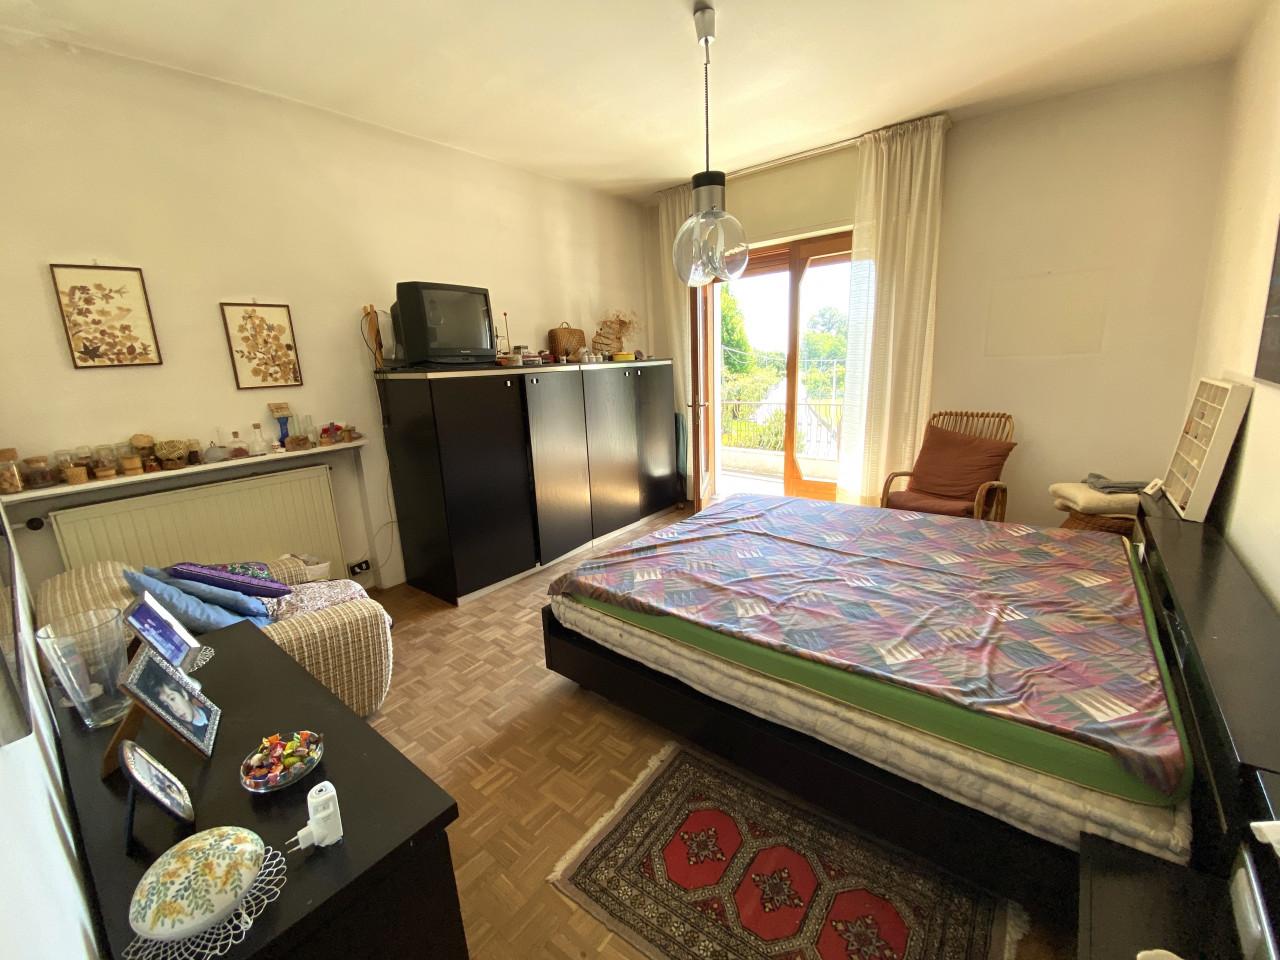 Casa singola con capannone in vendita in centro a Budoia - Rif. V.D.1 https://images.gestionaleimmobiliare.it/foto/annunci/200702/2265893/1280x1280/008__img_2985.jpg